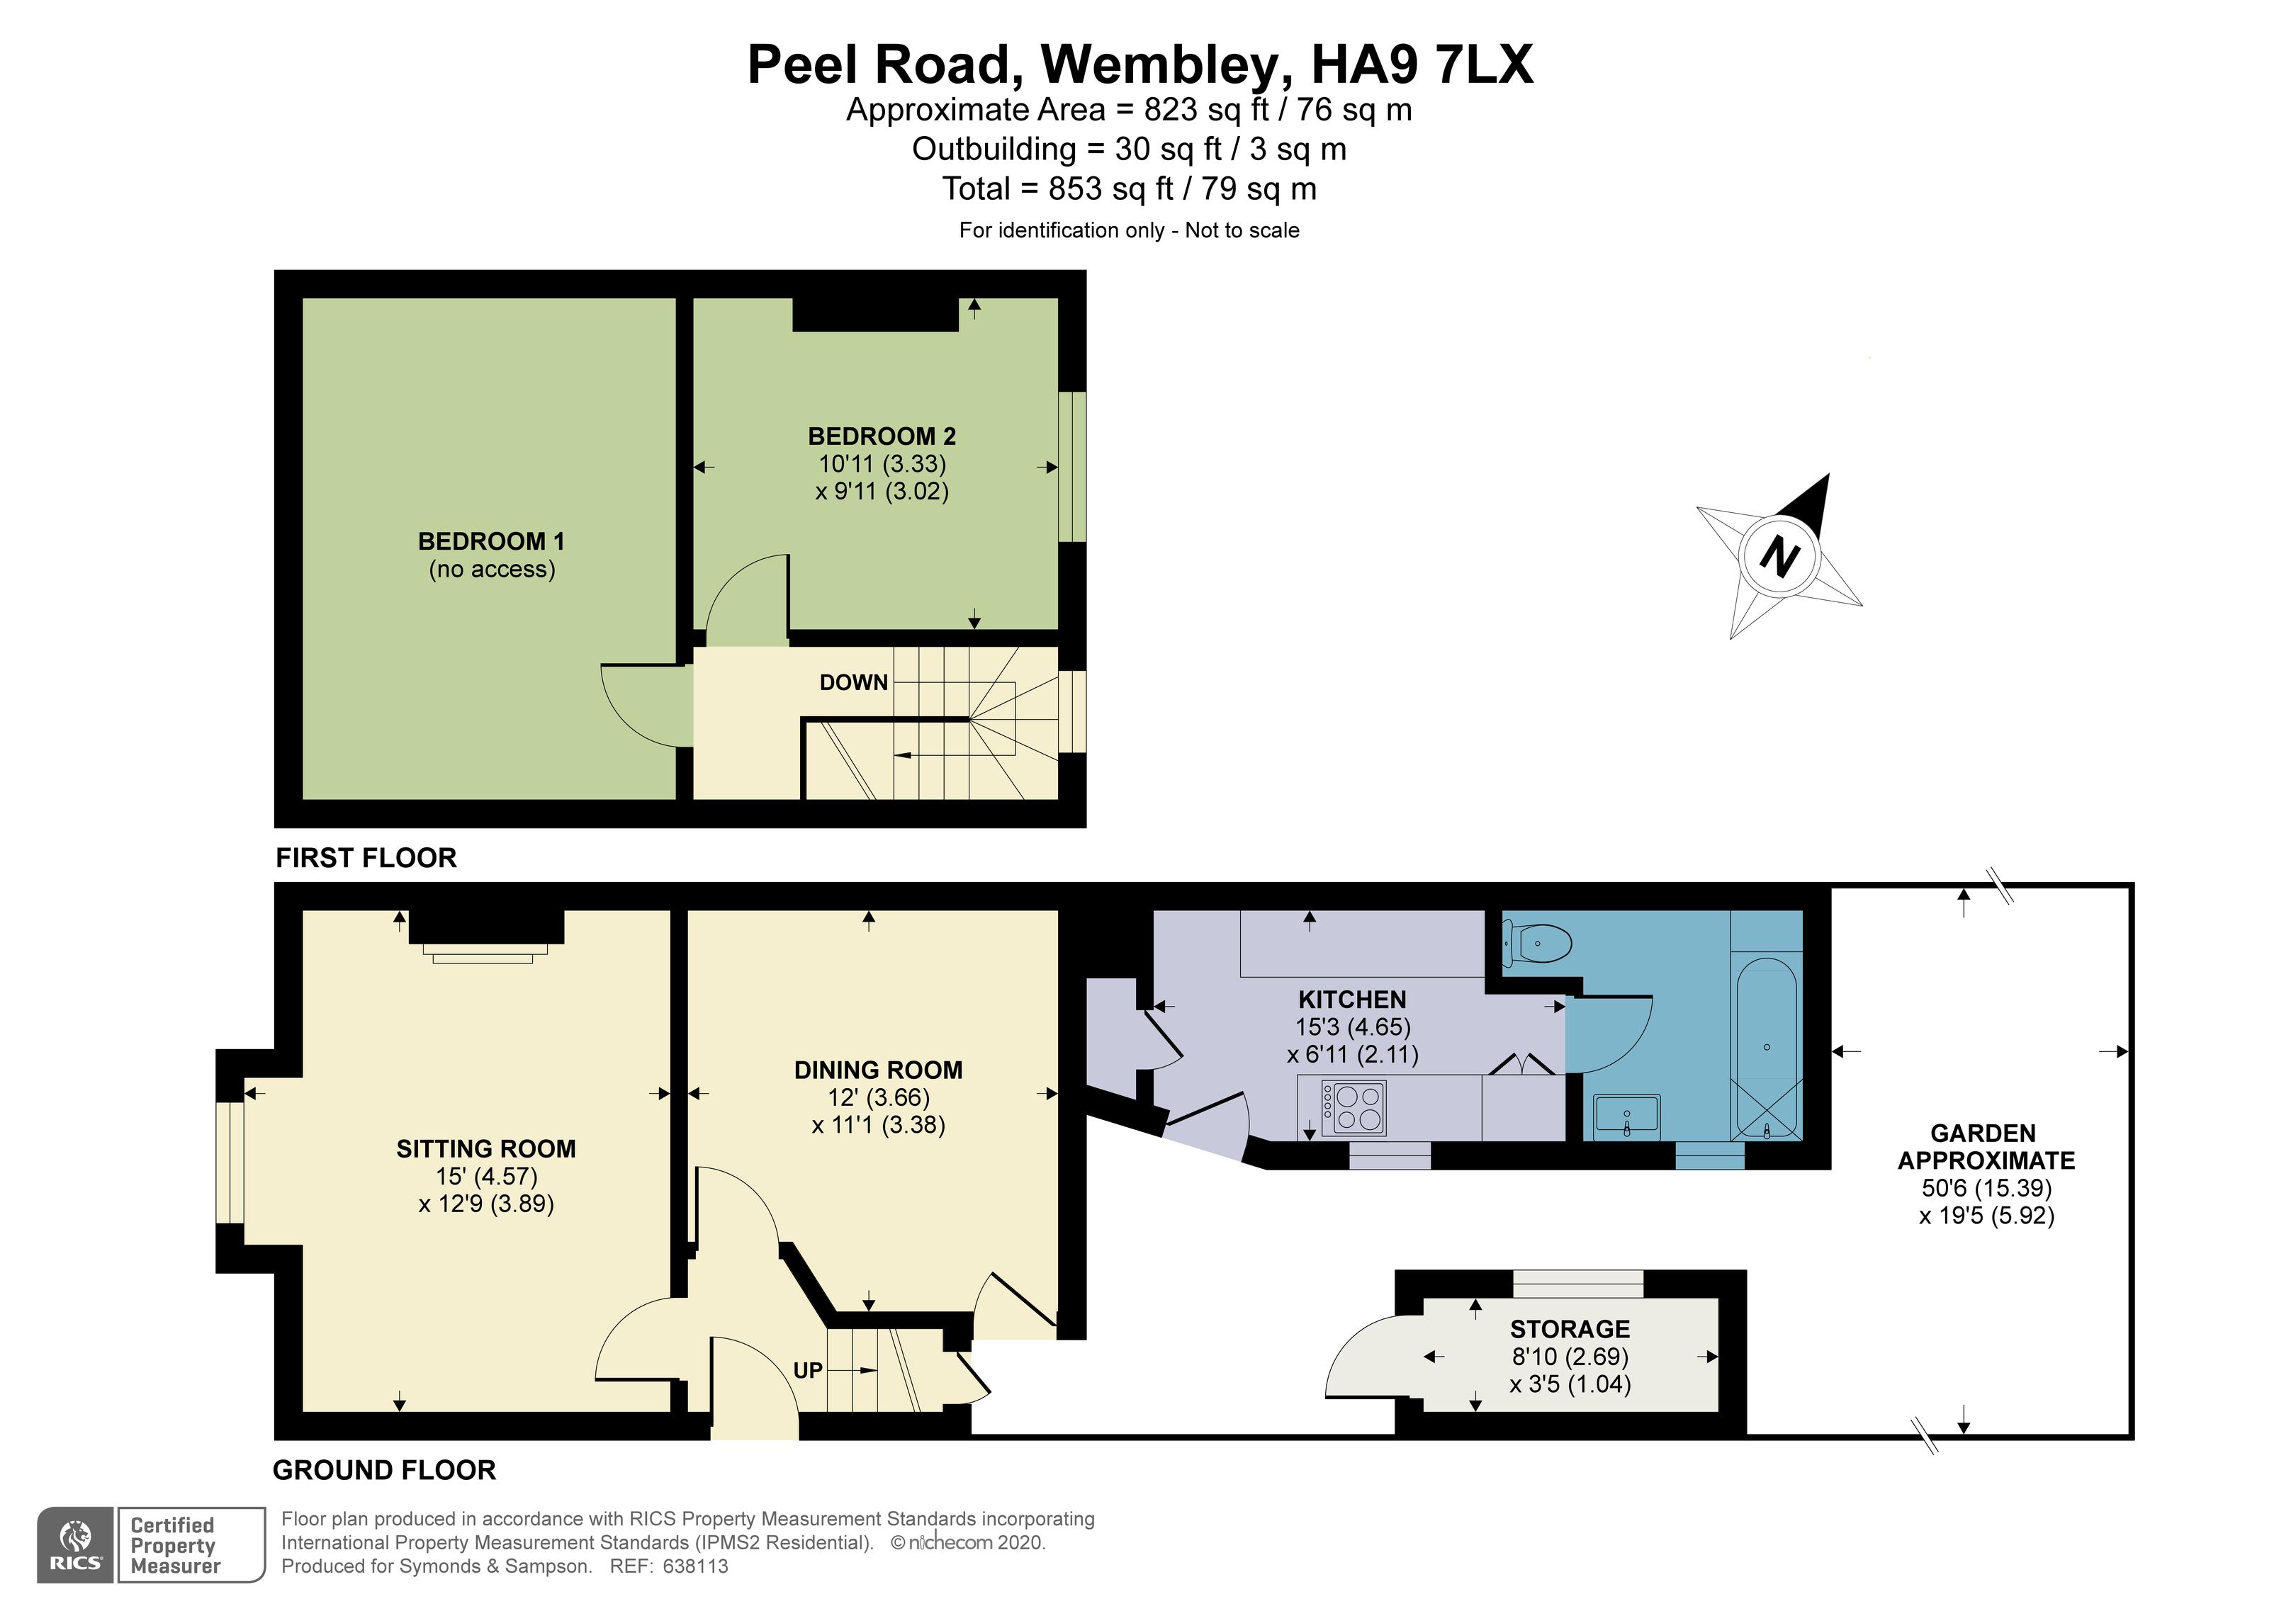 Floorplan - Peel Road, Wembley, HA9 7LX